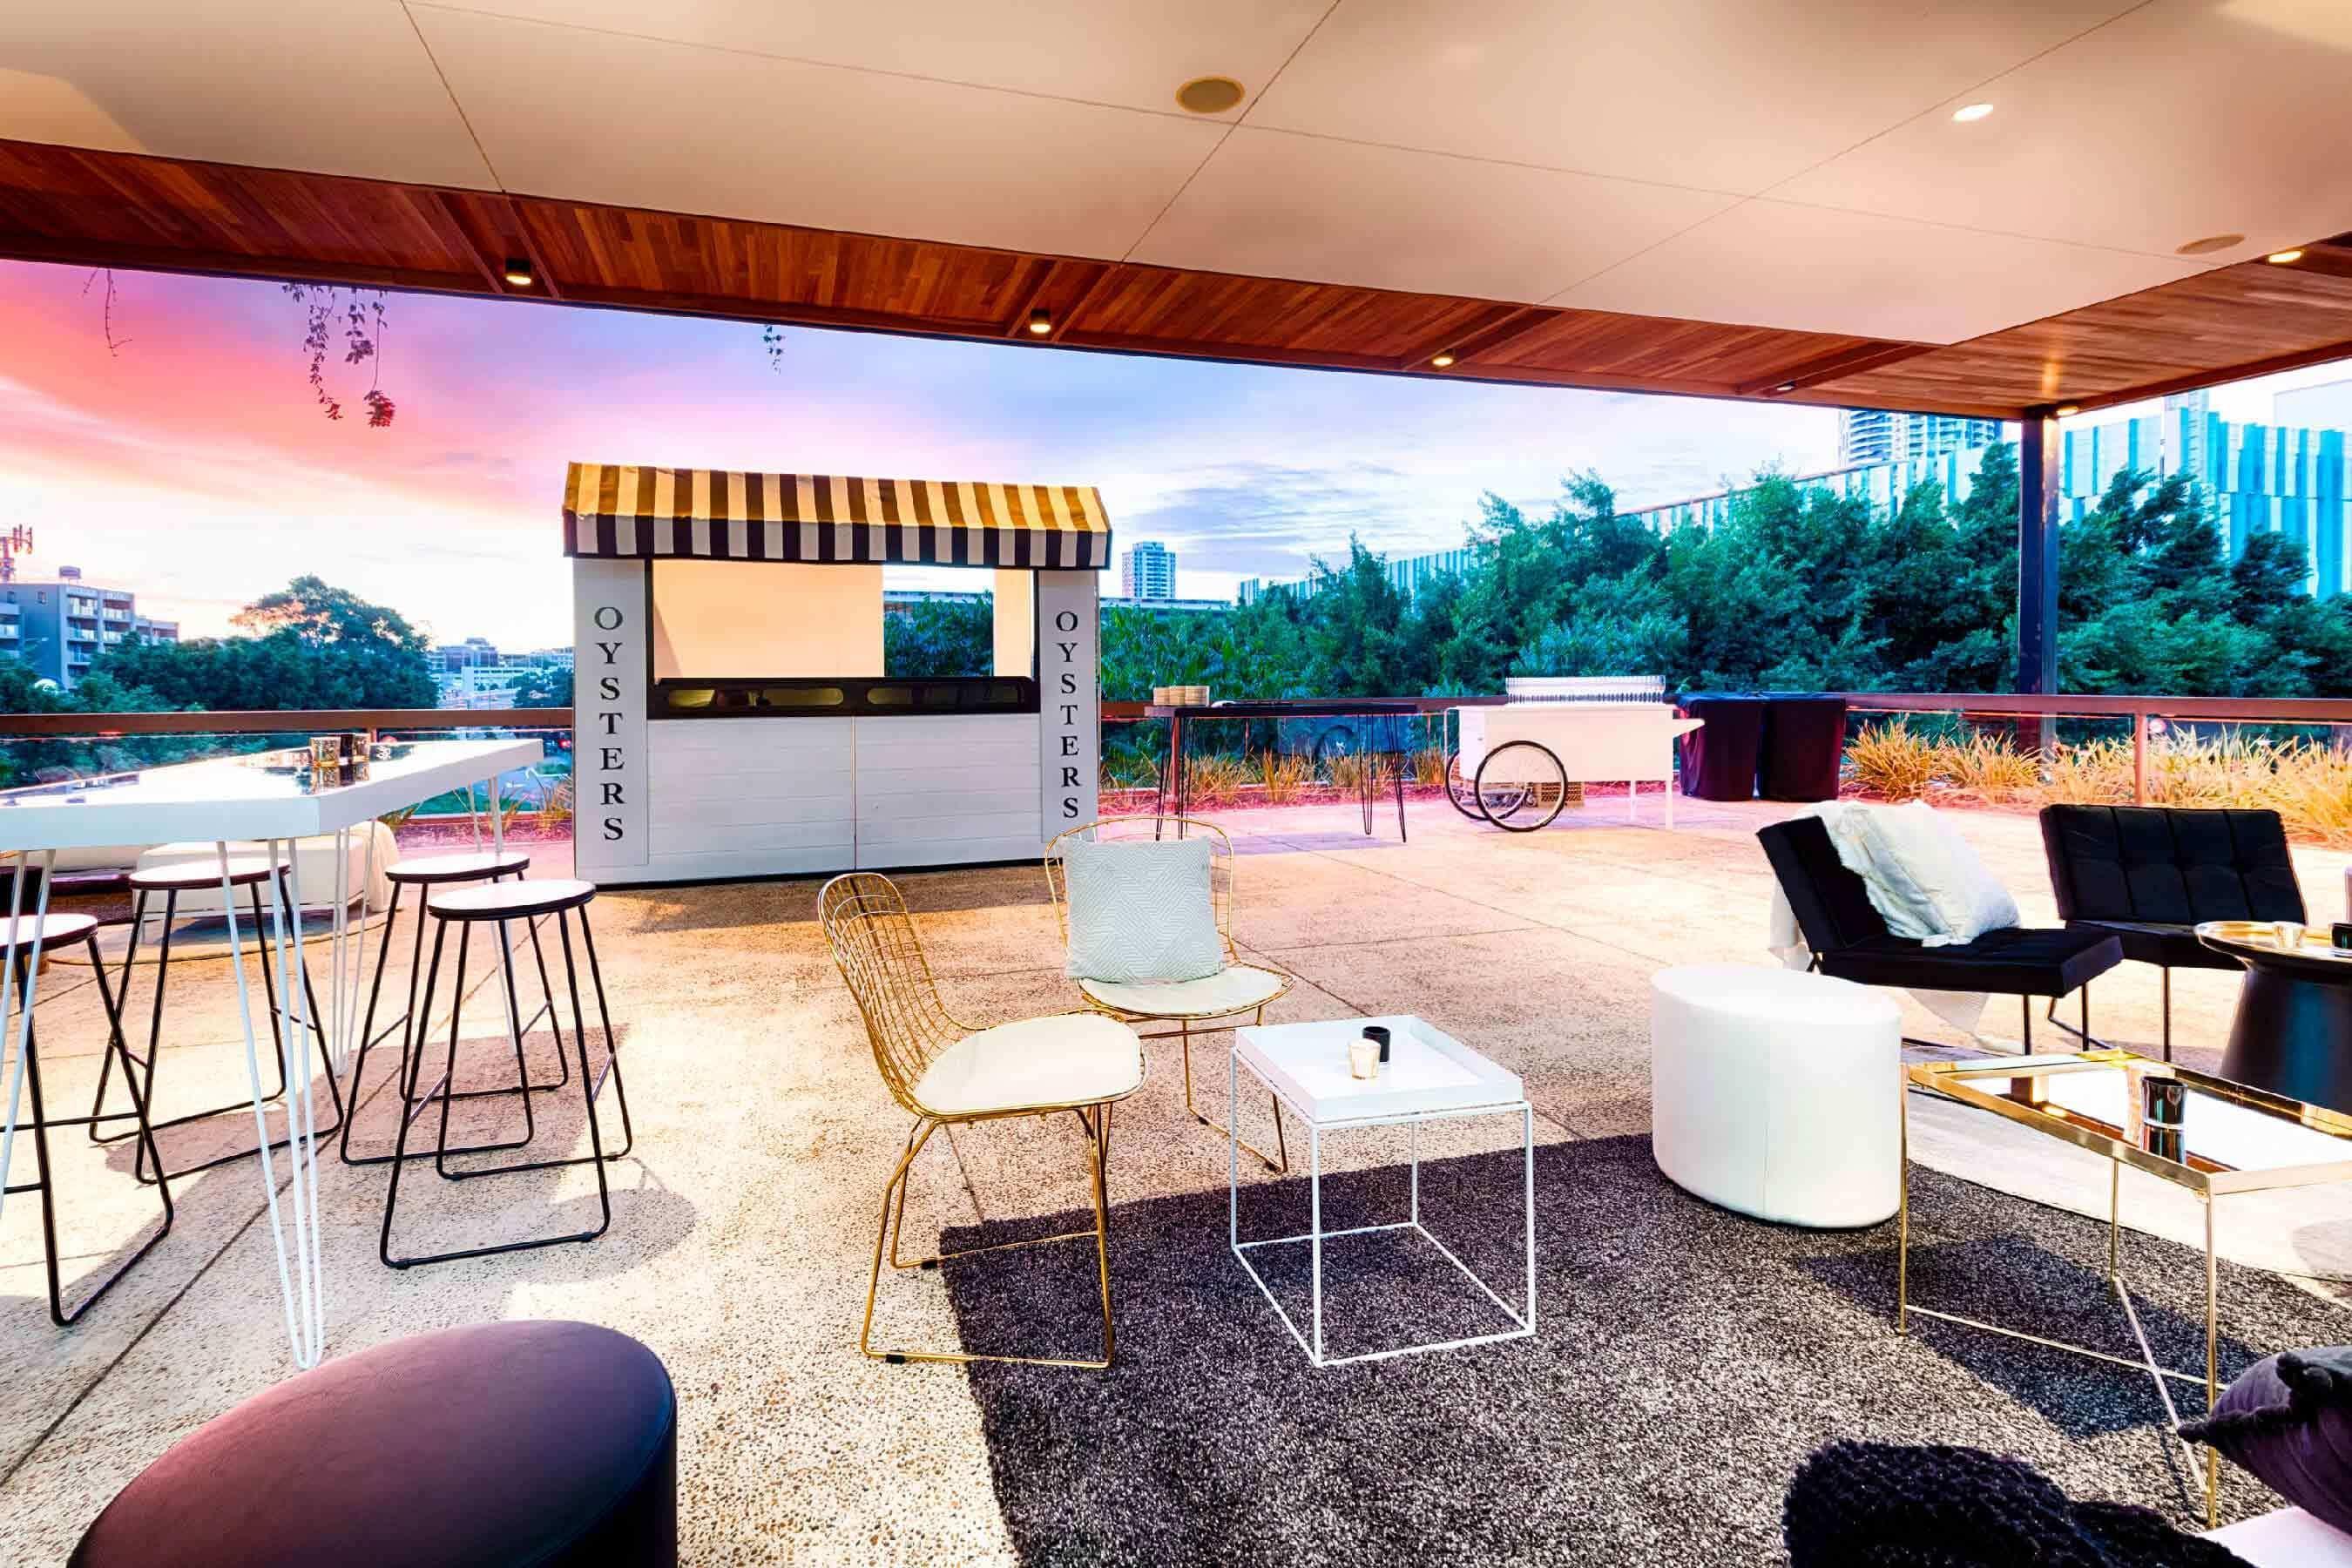 Venue Hire Brisbane CBD South Bank